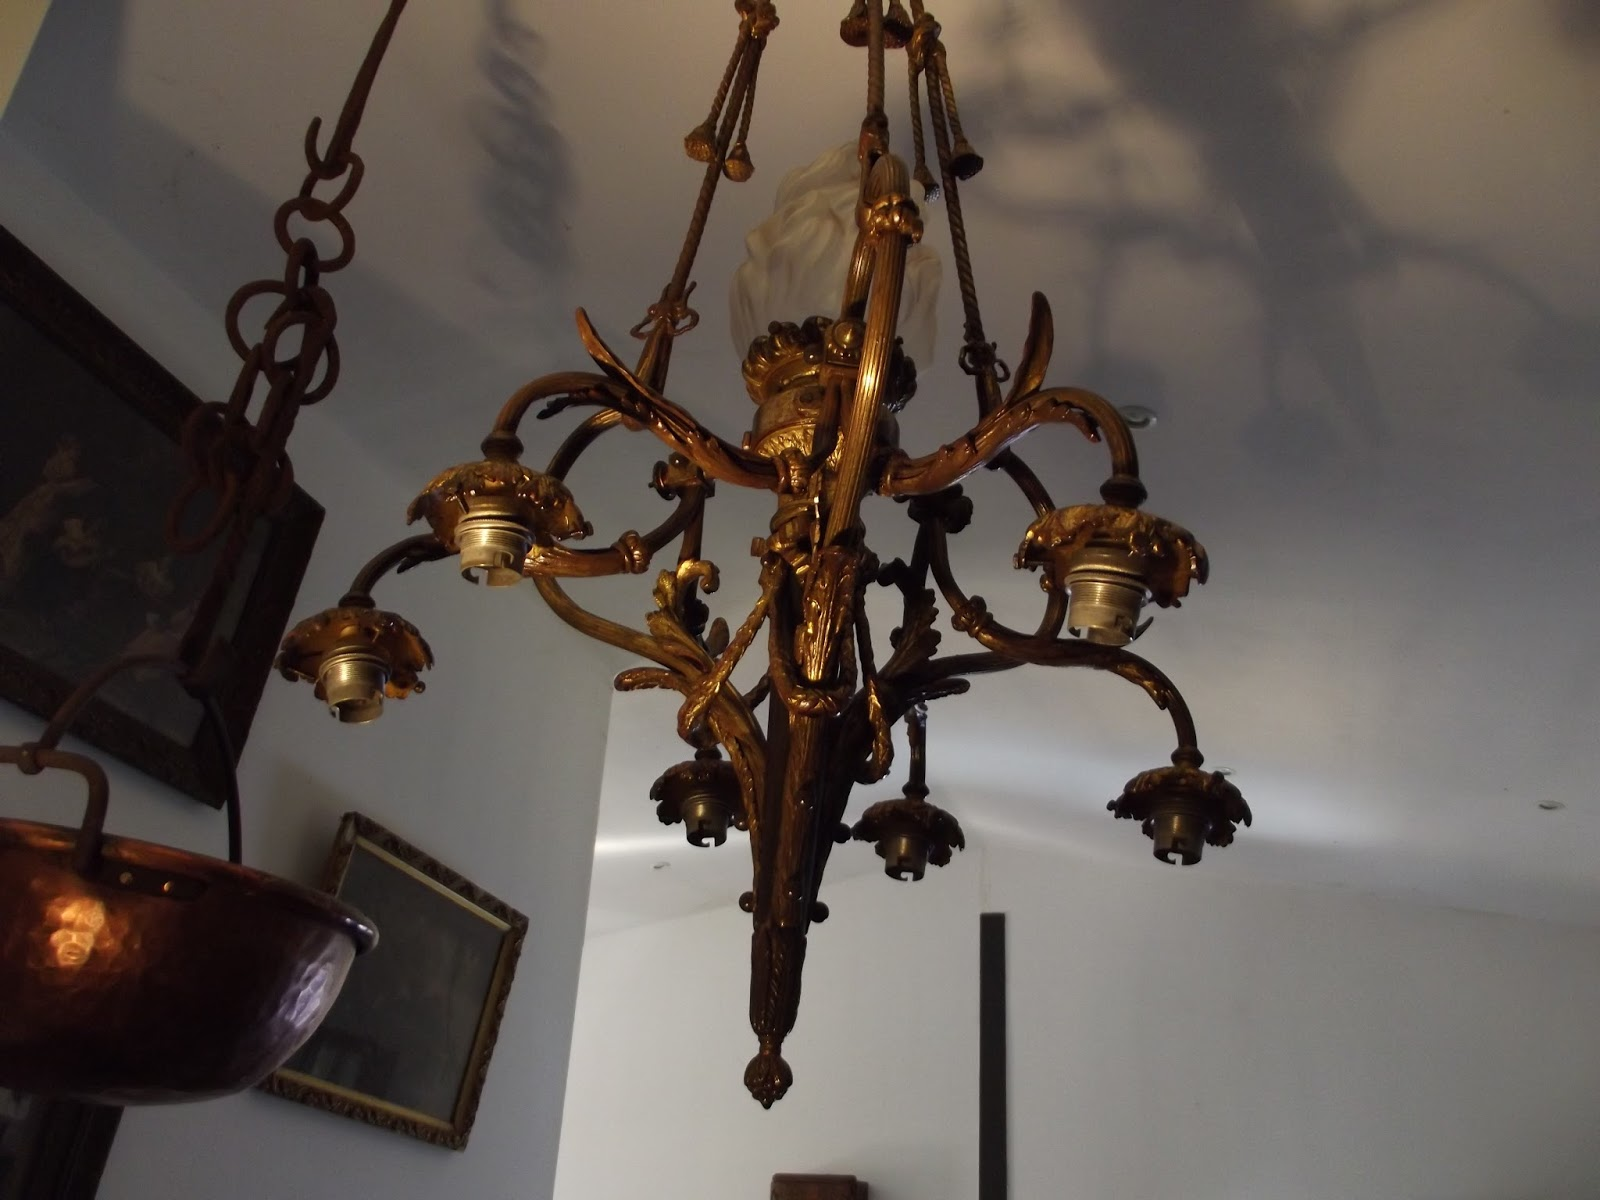 mus al et tr s important lustre suspension bronze 6 bras de lumi res. Black Bedroom Furniture Sets. Home Design Ideas